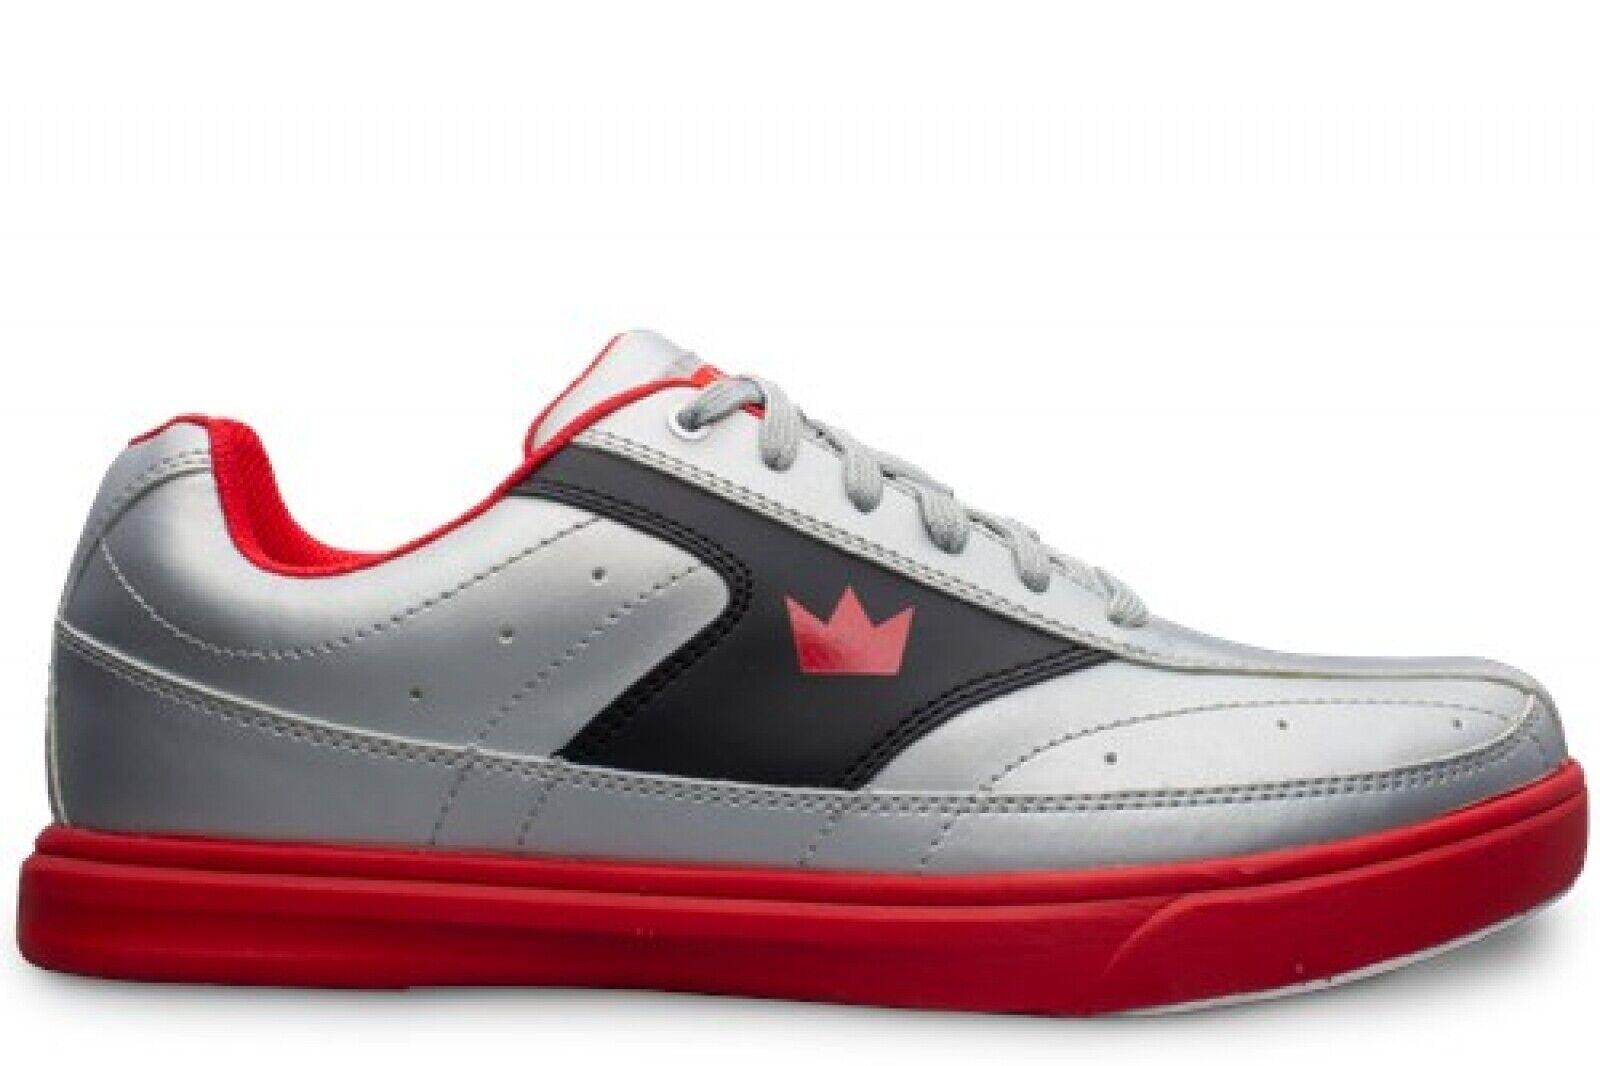 Brunswick Renegade Flash - Silver/Red - Bowling Shoes Men's